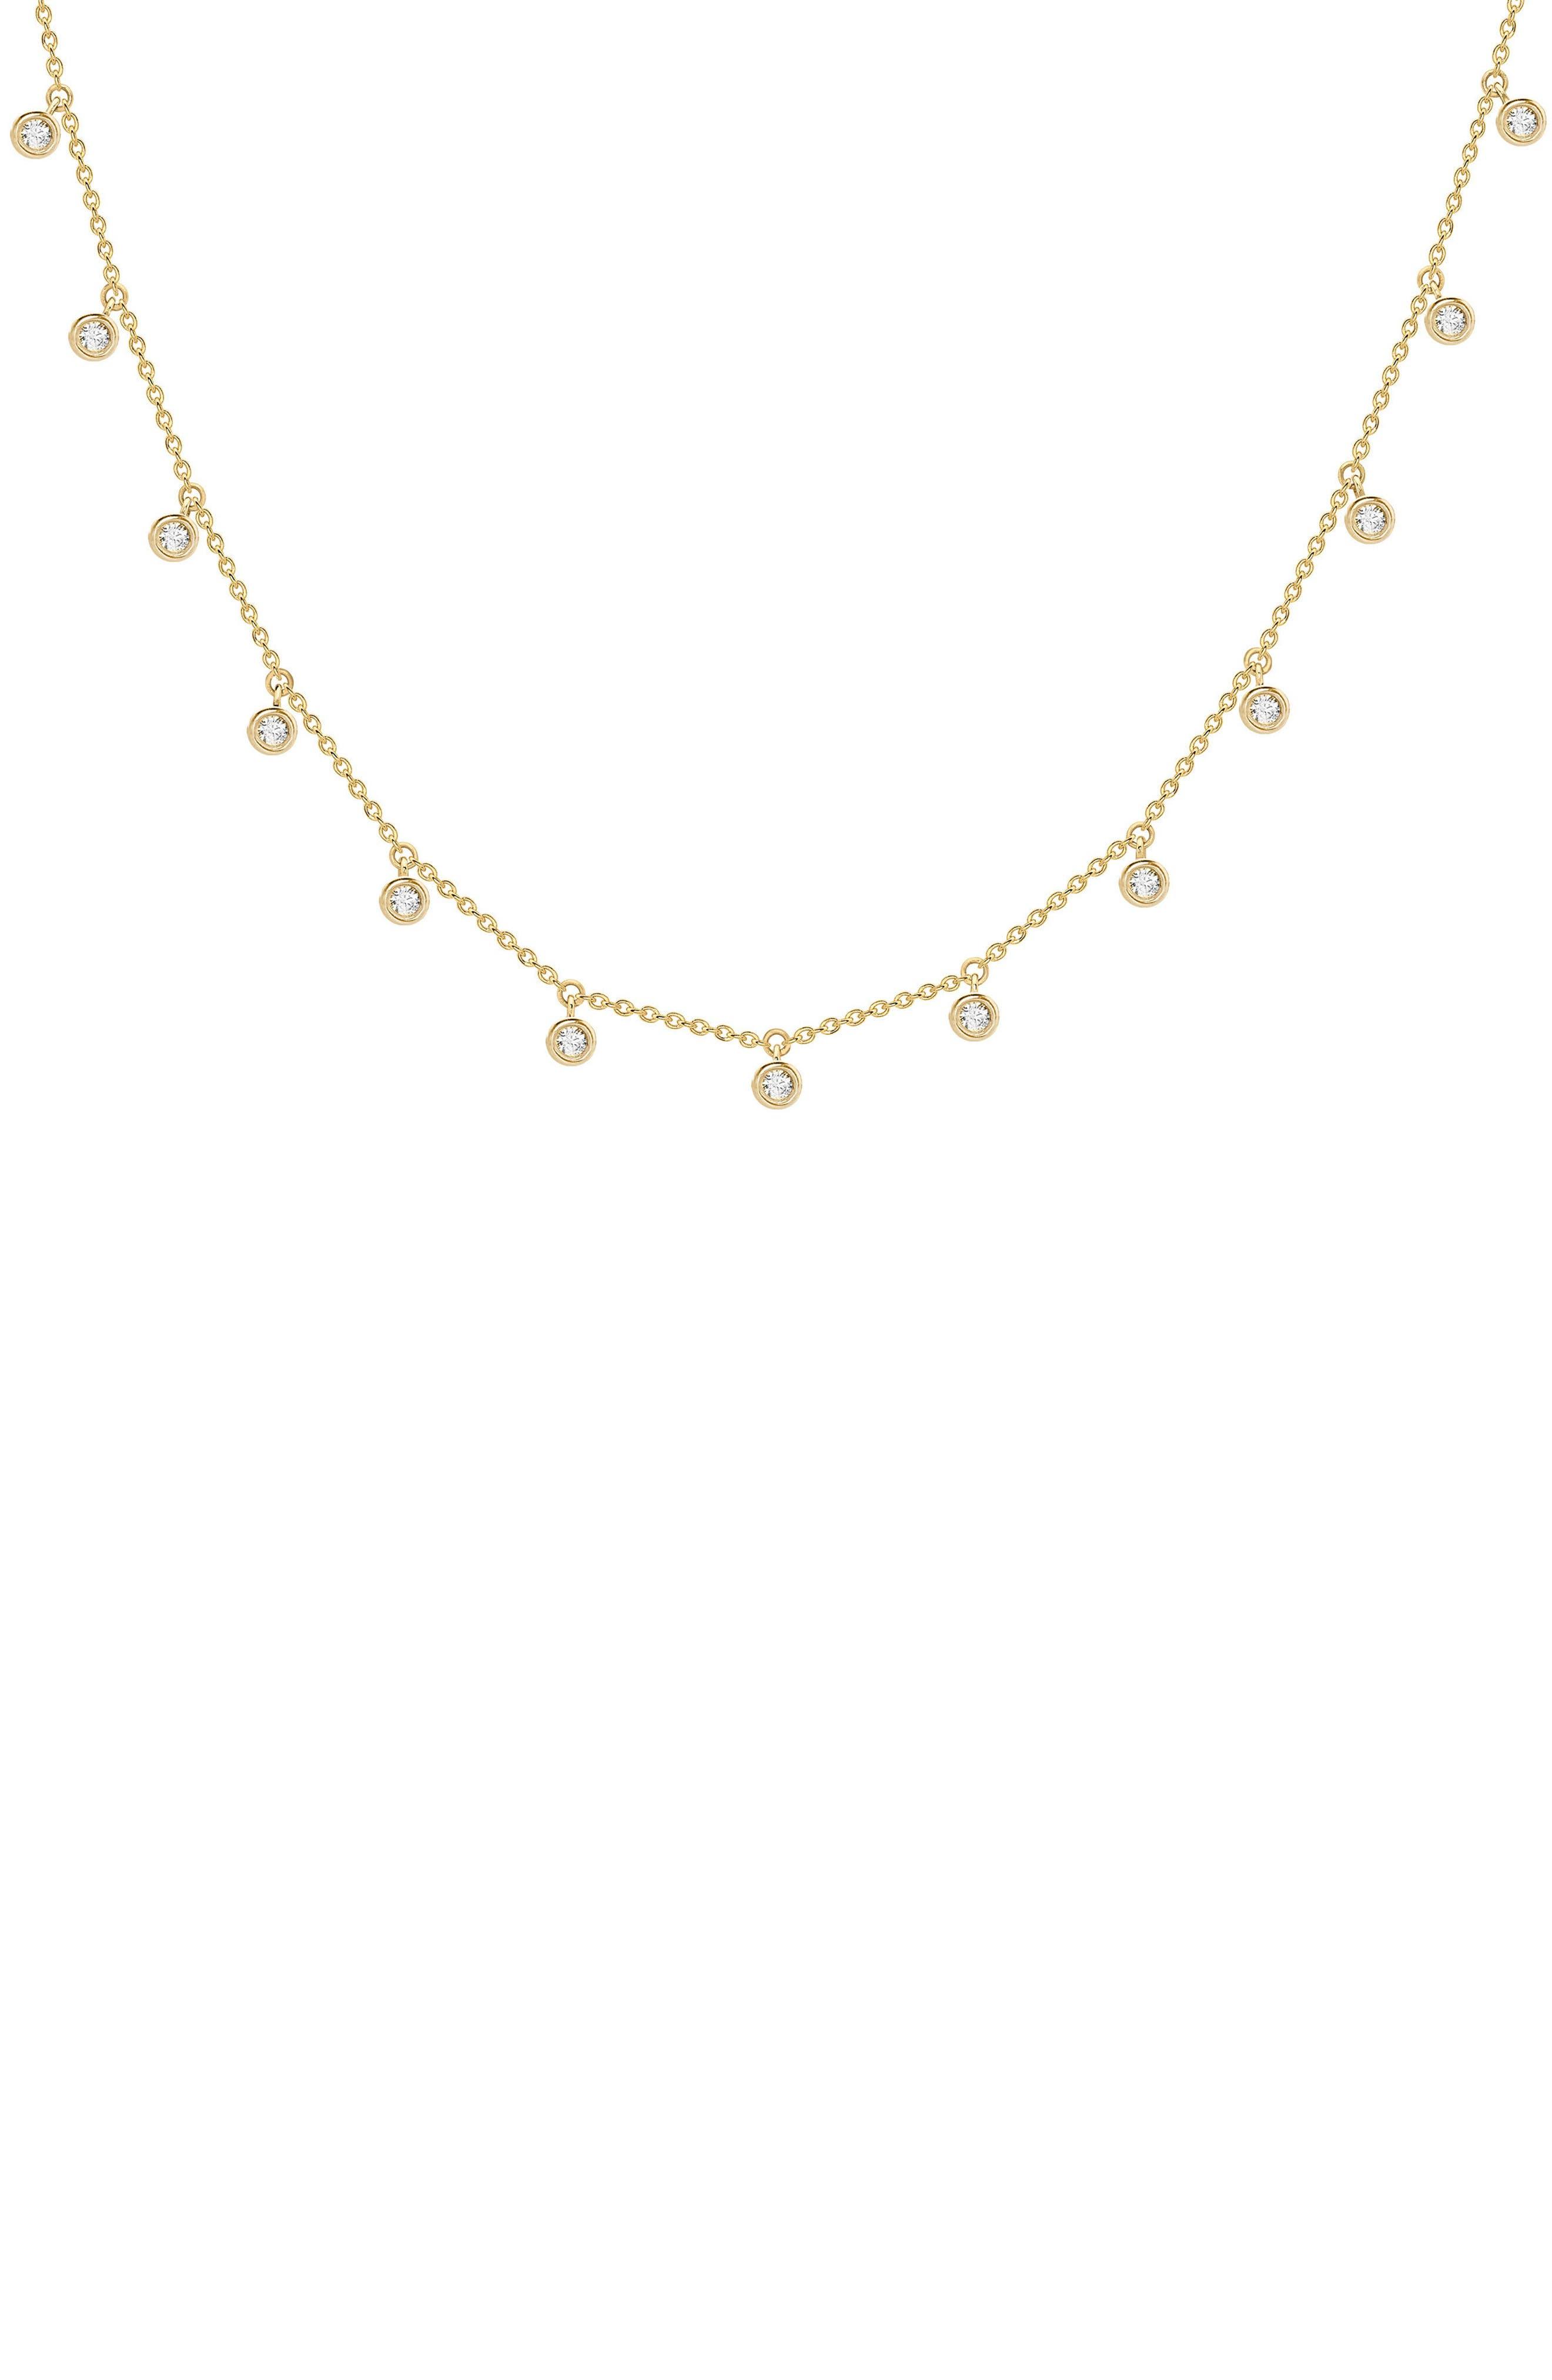 Interstellar Necklace,                         Main,                         color, Gold